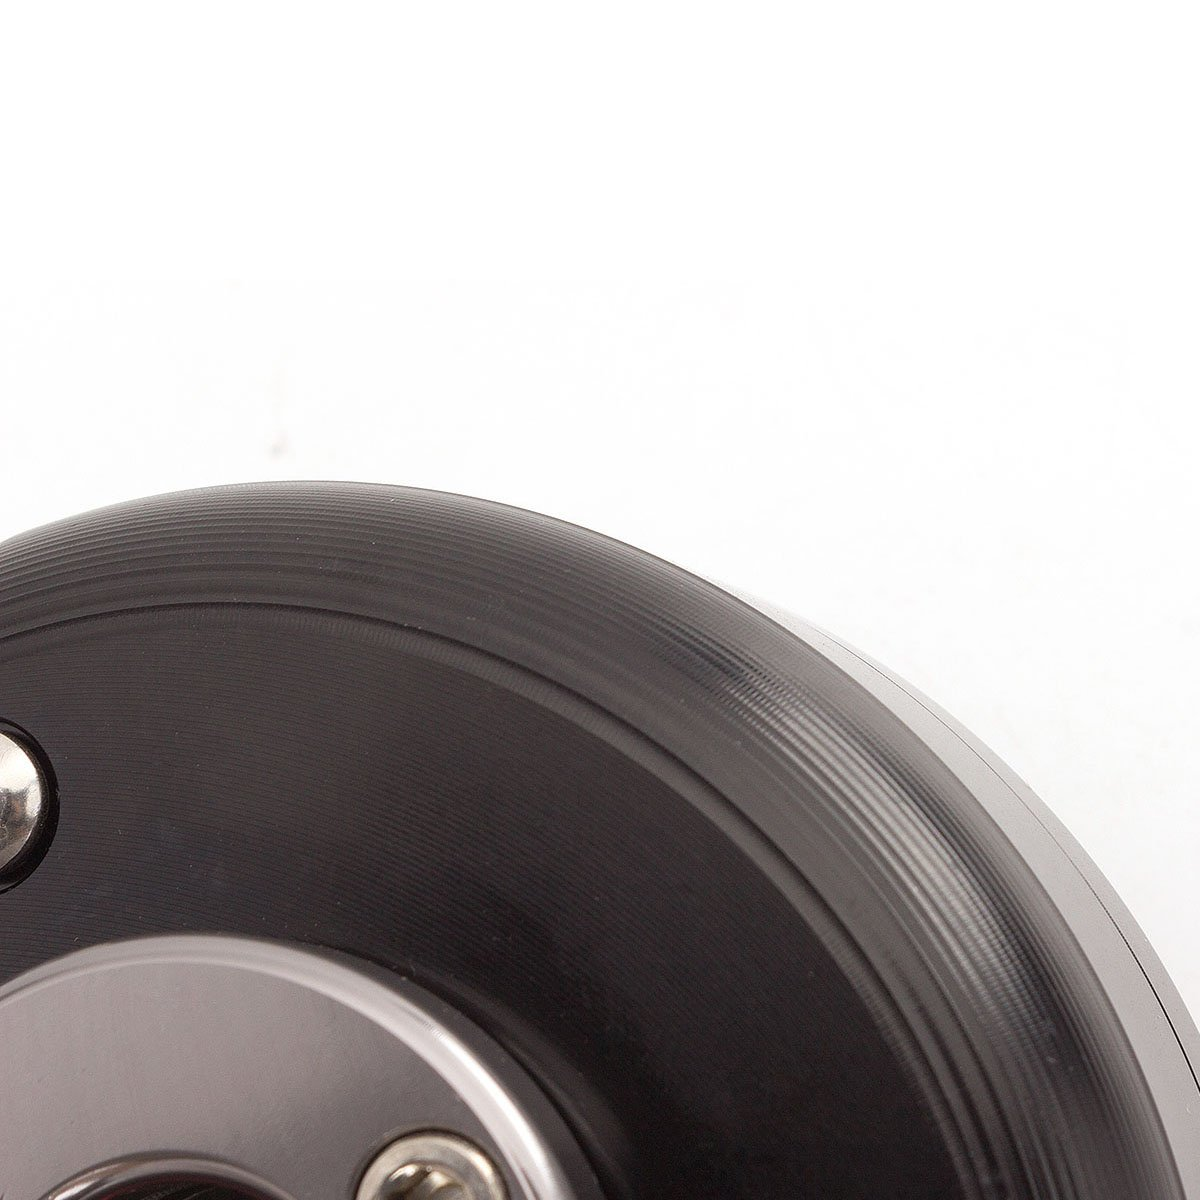 Motorcycle Adjustable Universal CNC Steering Damper Stabilizer Linear For SUZUKI GSXR 1000 750 K4,KAWASAKI ZX636 ZX6R,HONDA CB1000R,KTM DUKE125,YAMAHA YZF R6 MT-09 XJR1300